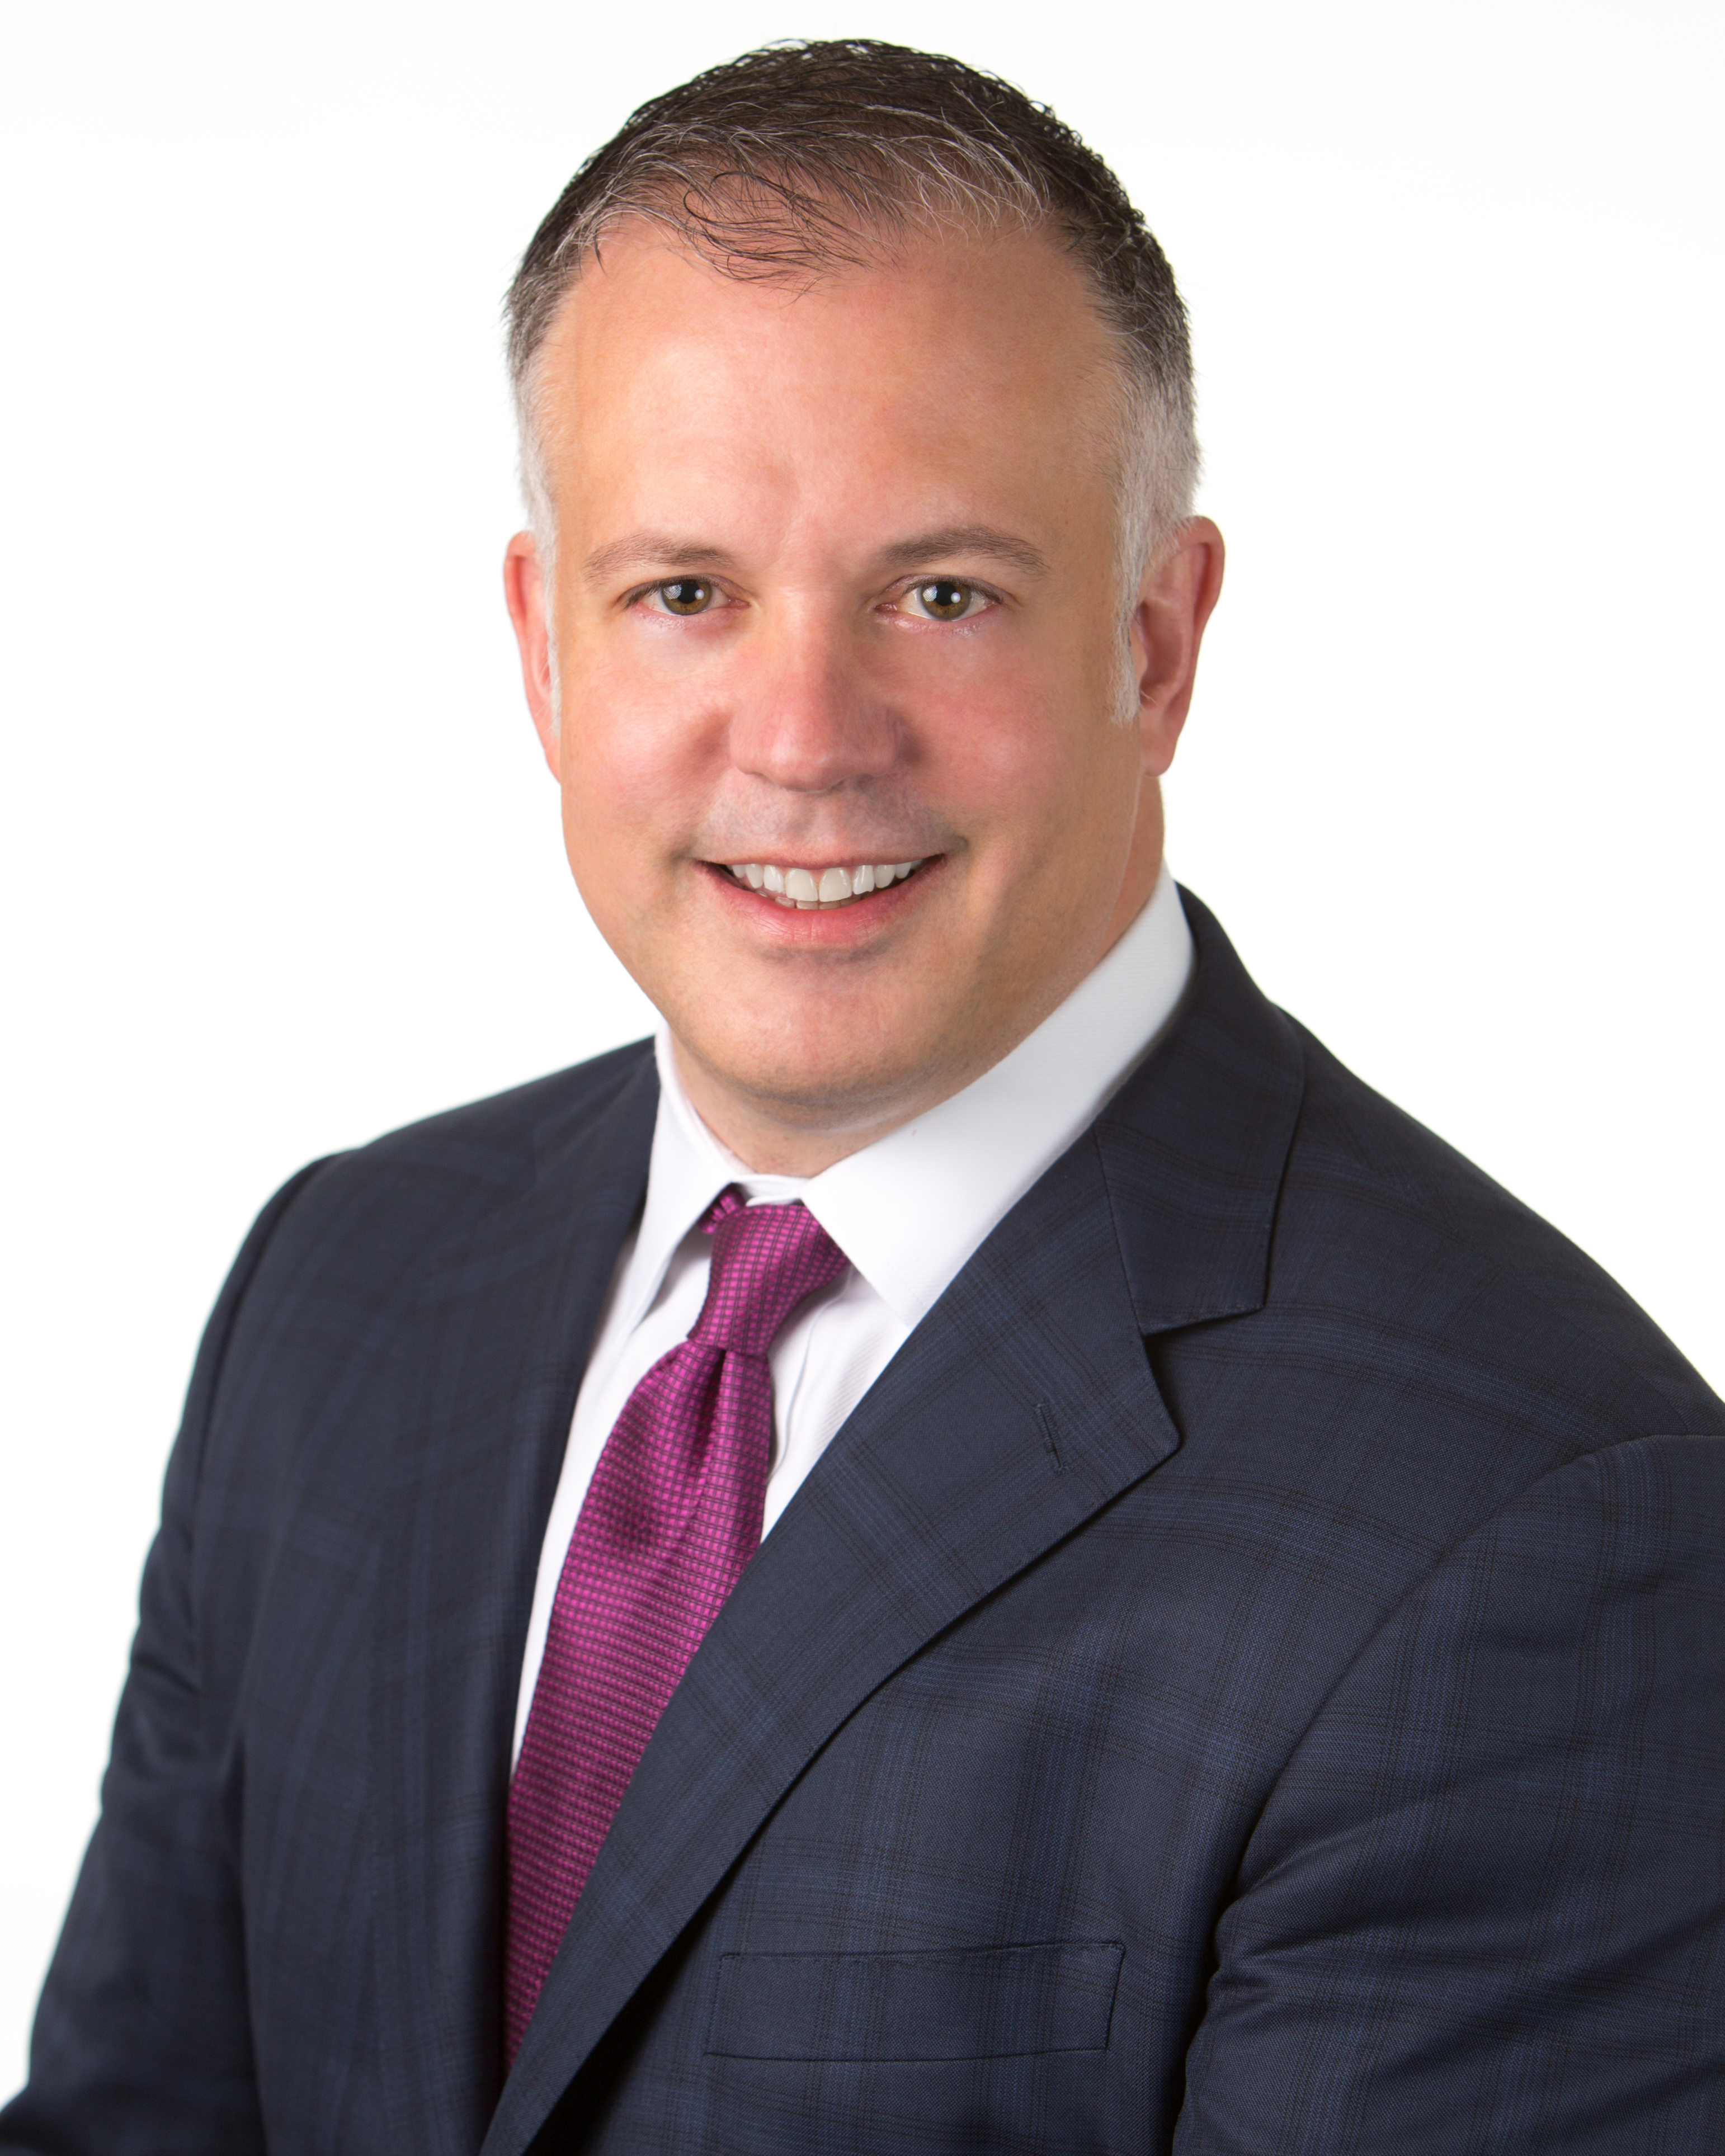 David DeSantis